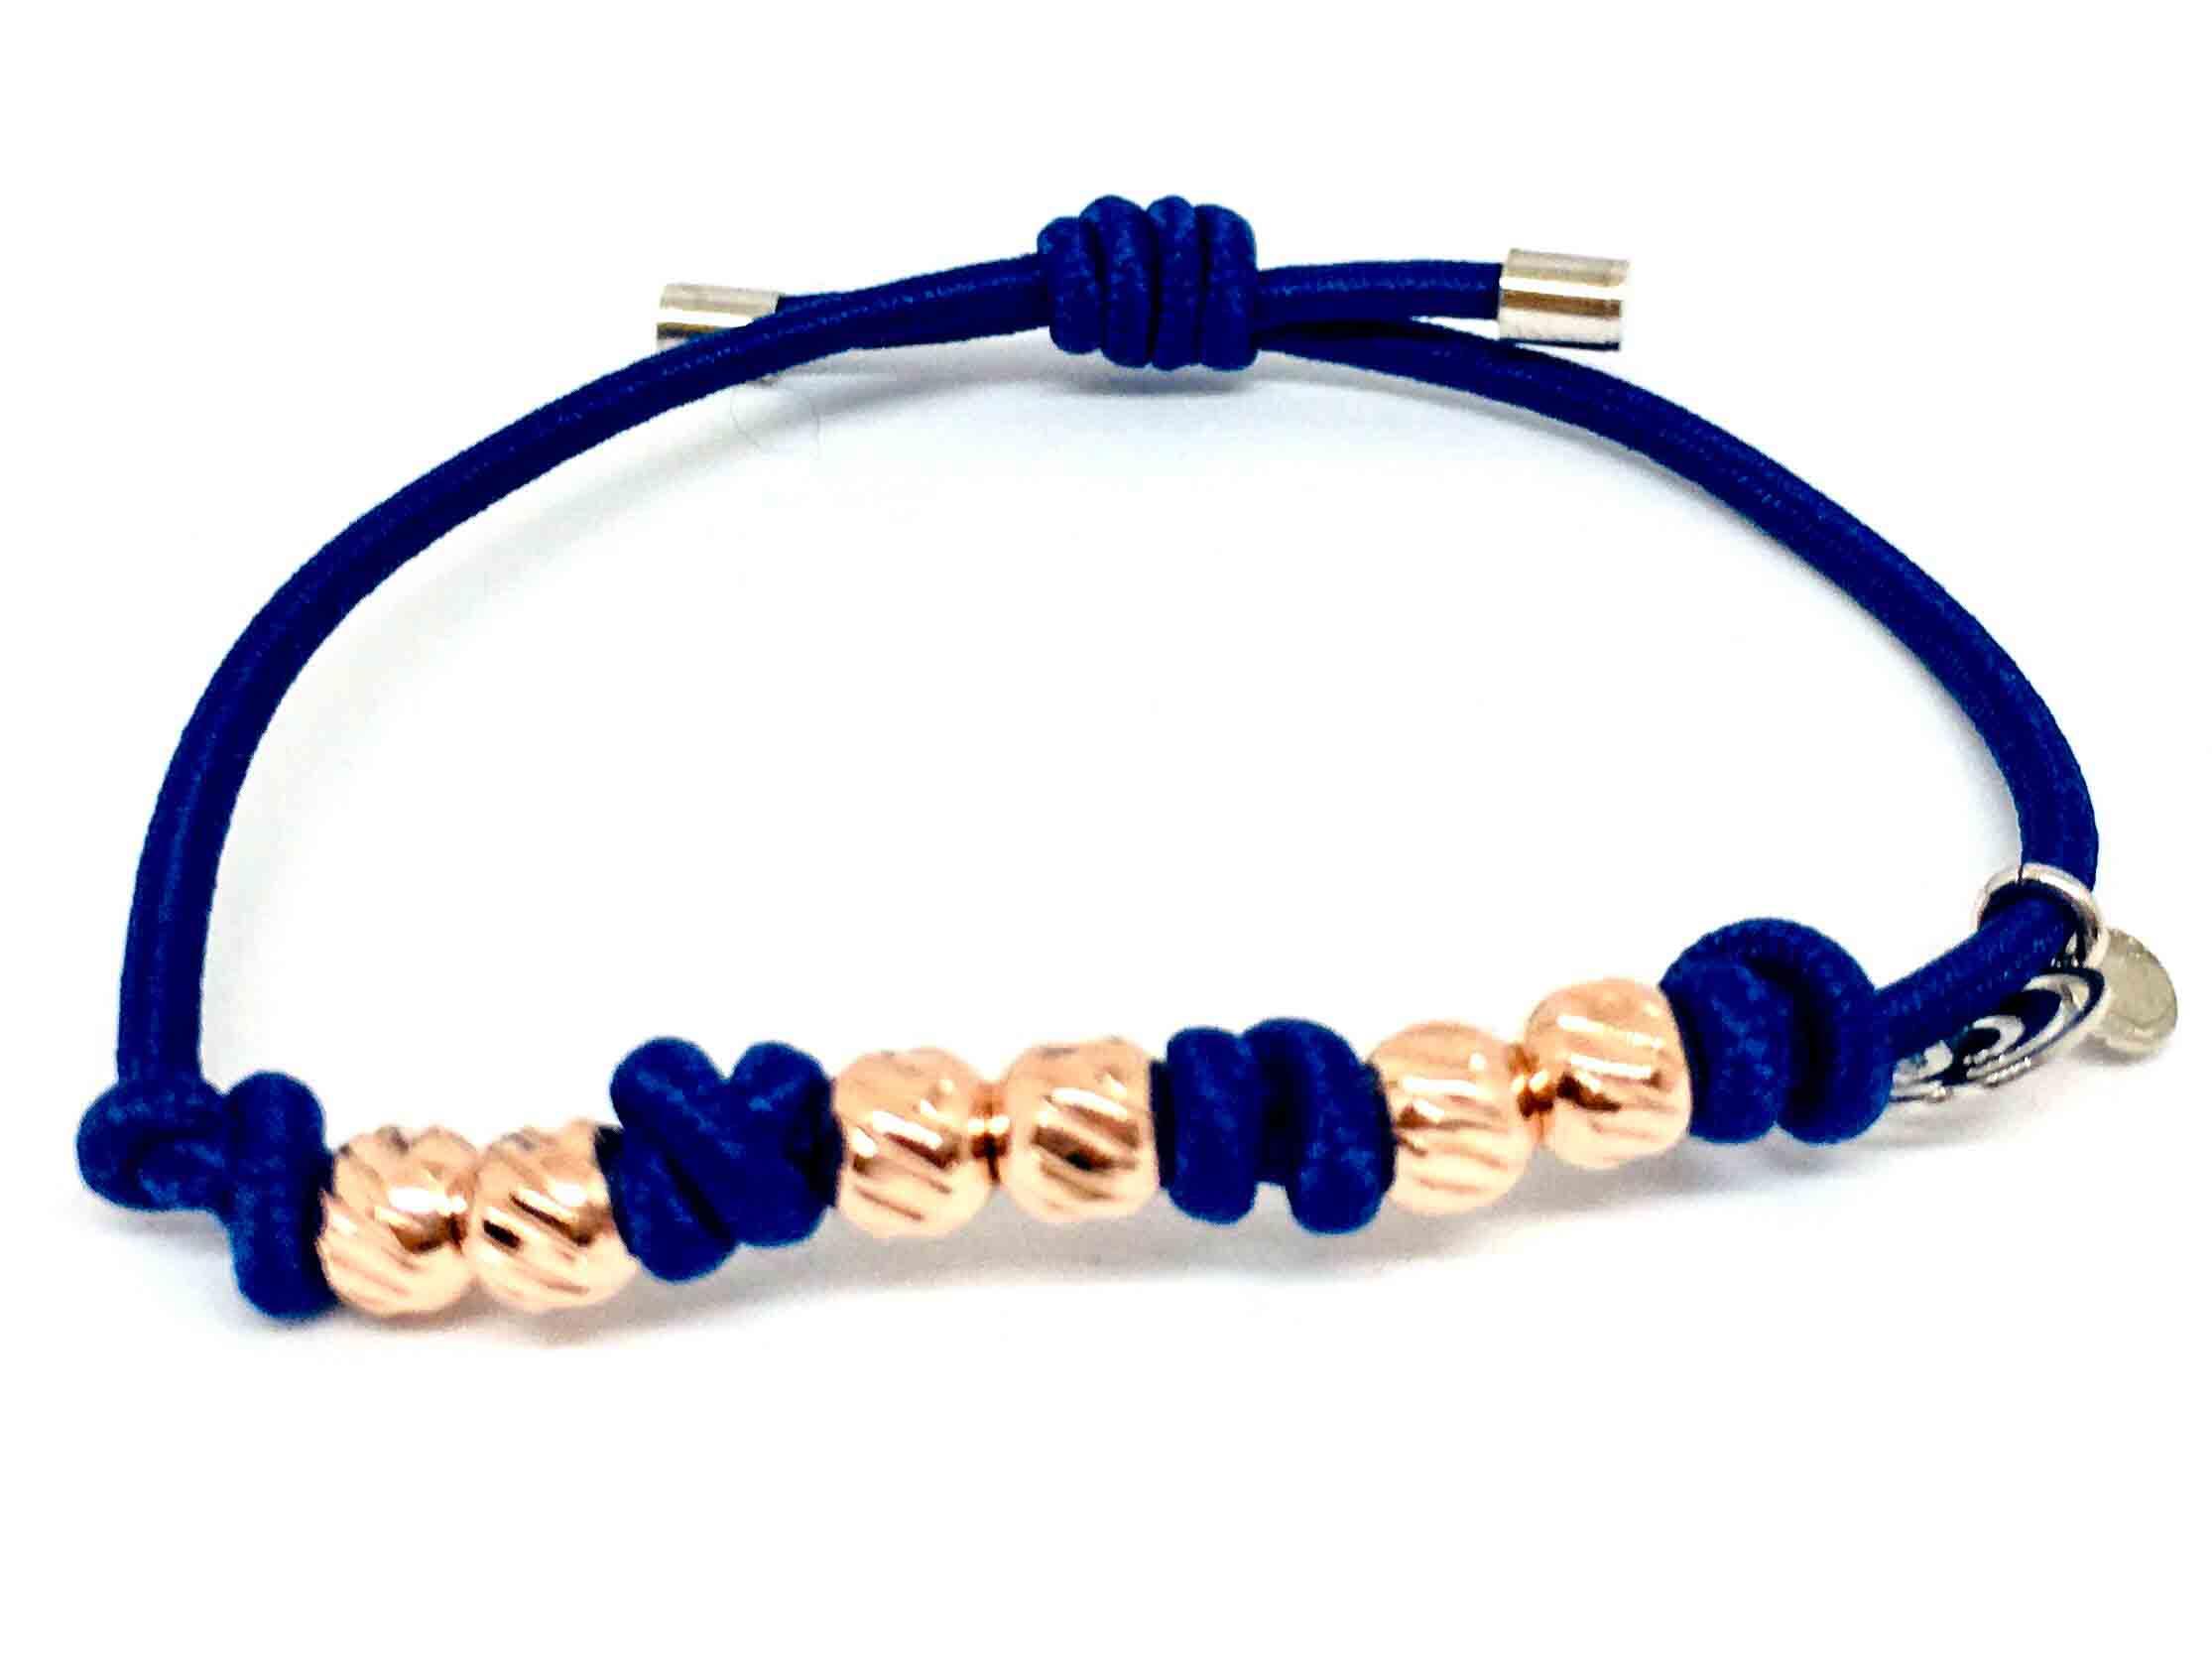 Bracciale-blu-elastico-per-capelli